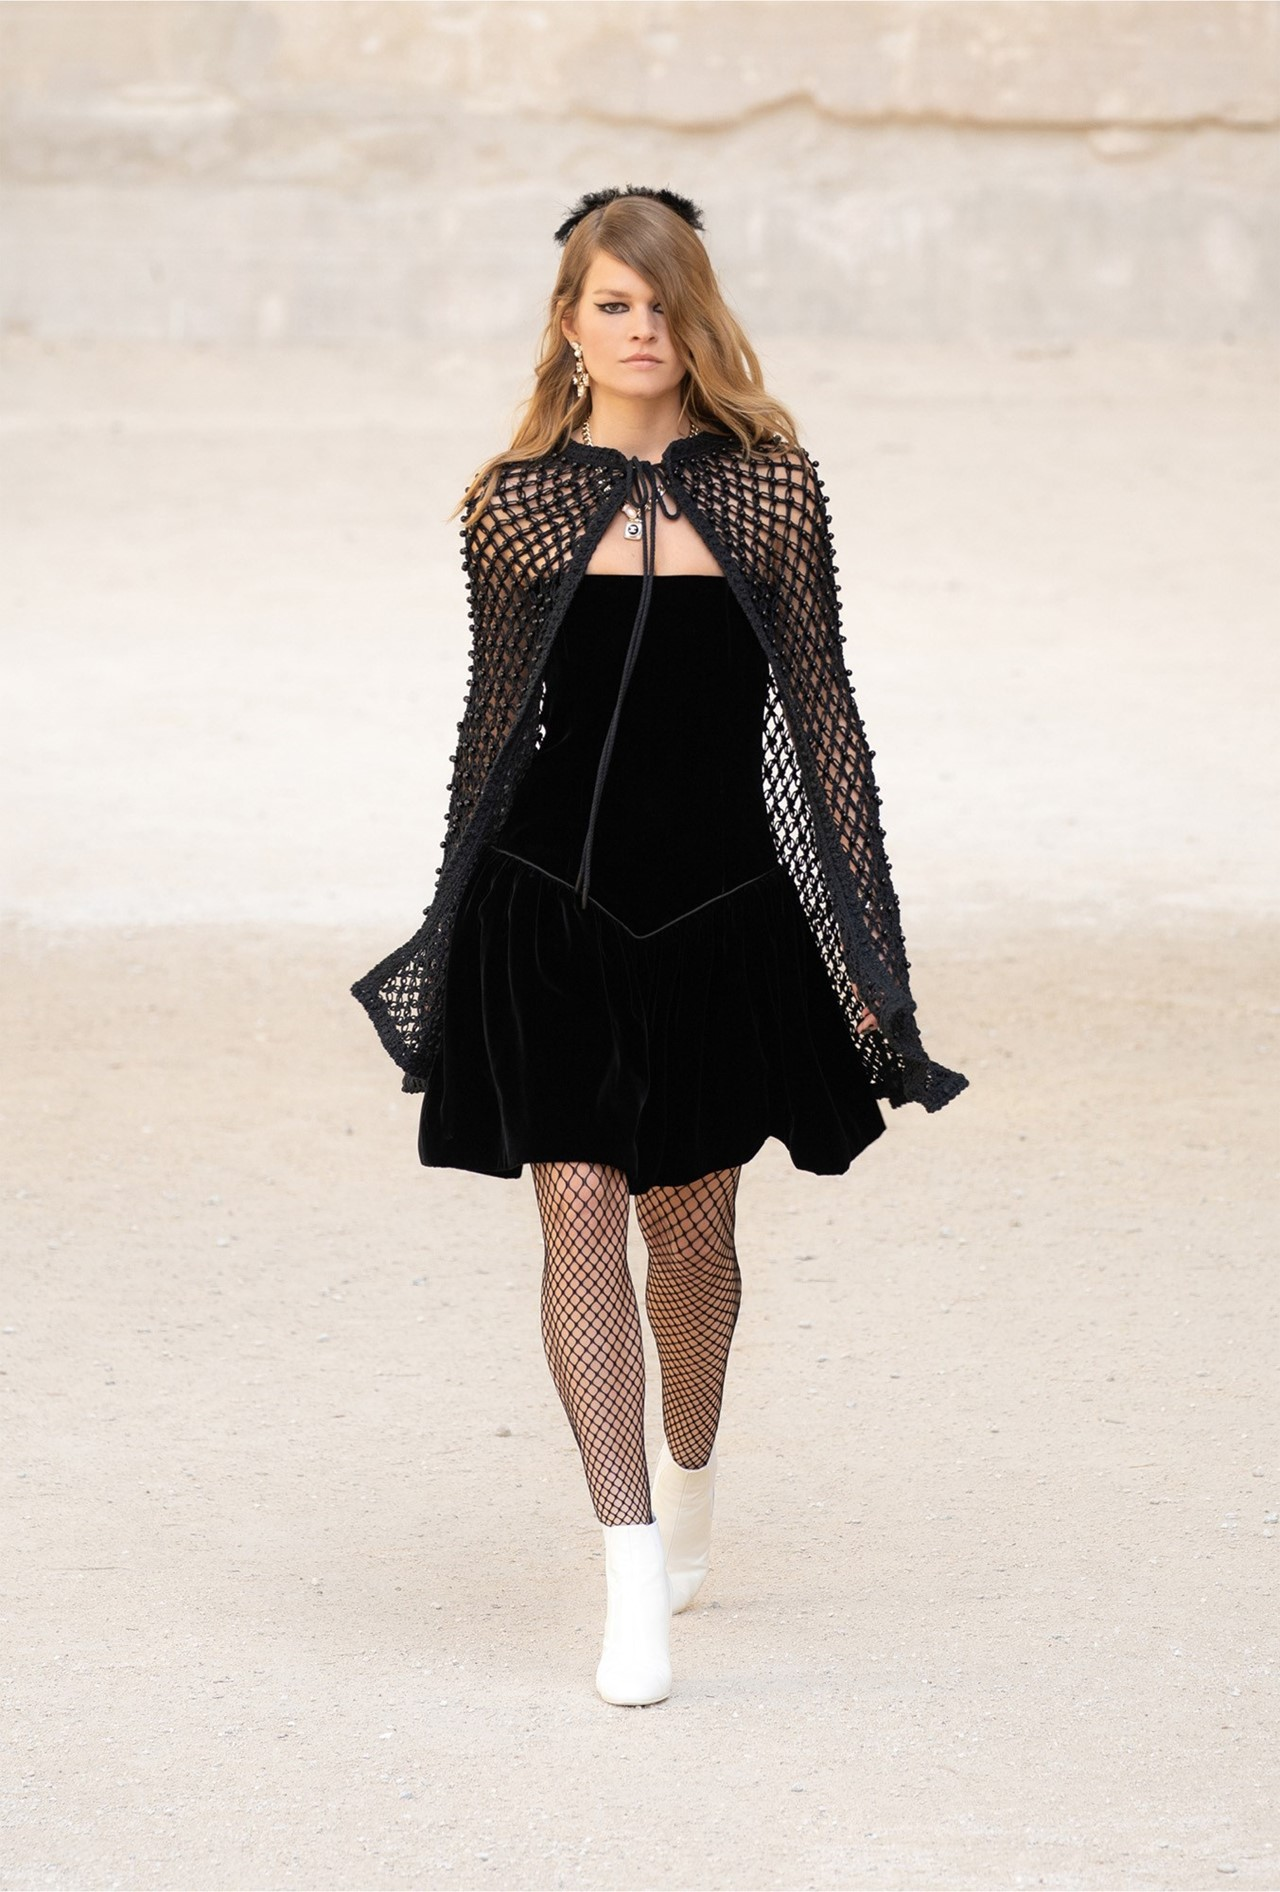 Chanel_Cruise_2022_Fashionela (65)